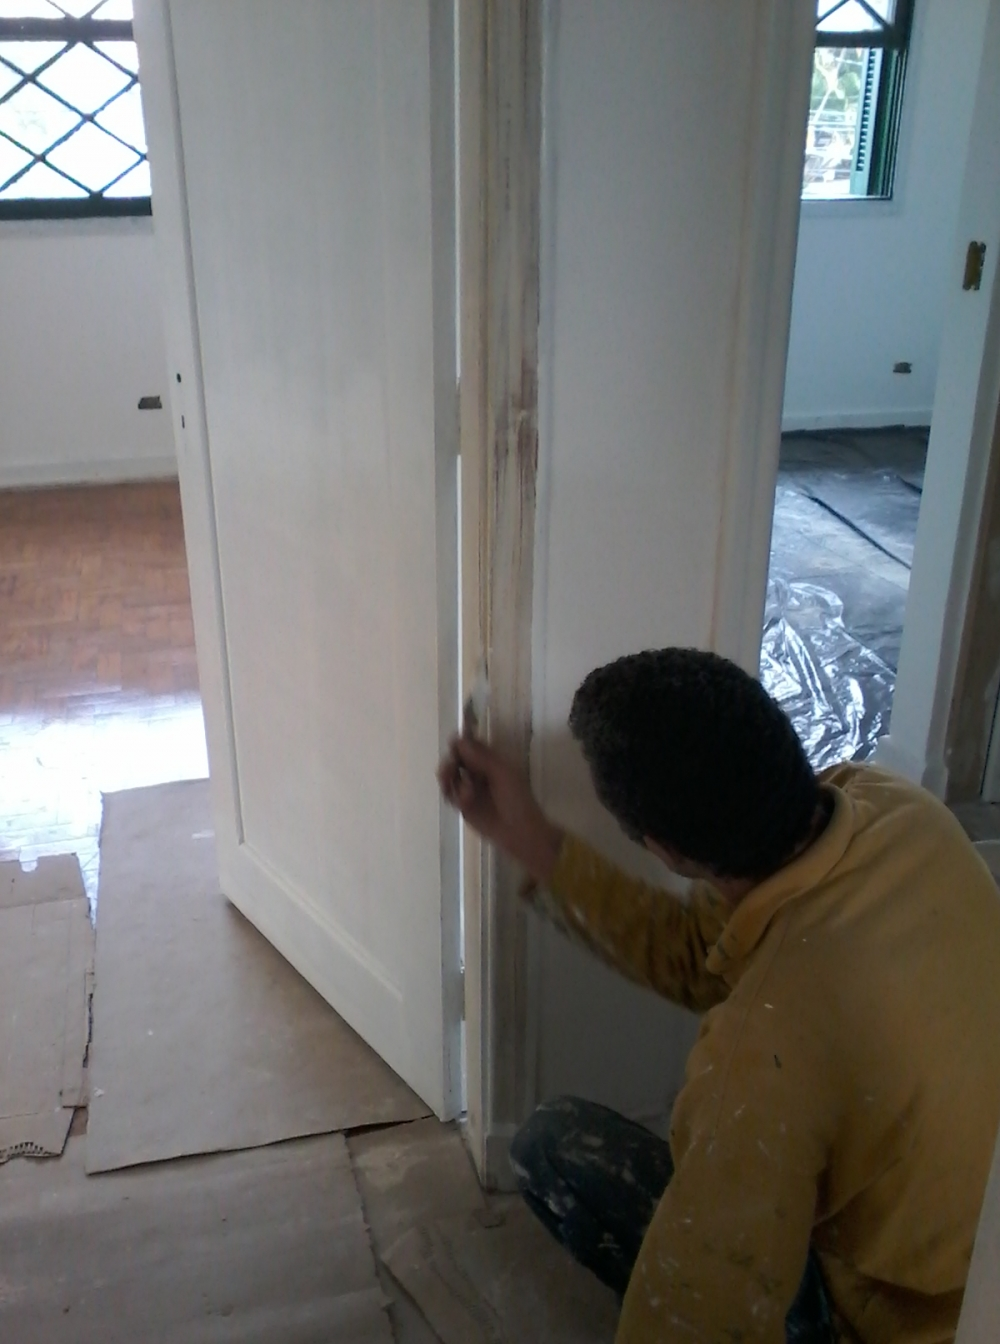 Serviços de Pintura Residencial no Morumbi - Prestação de Serviços de Pintura Predial